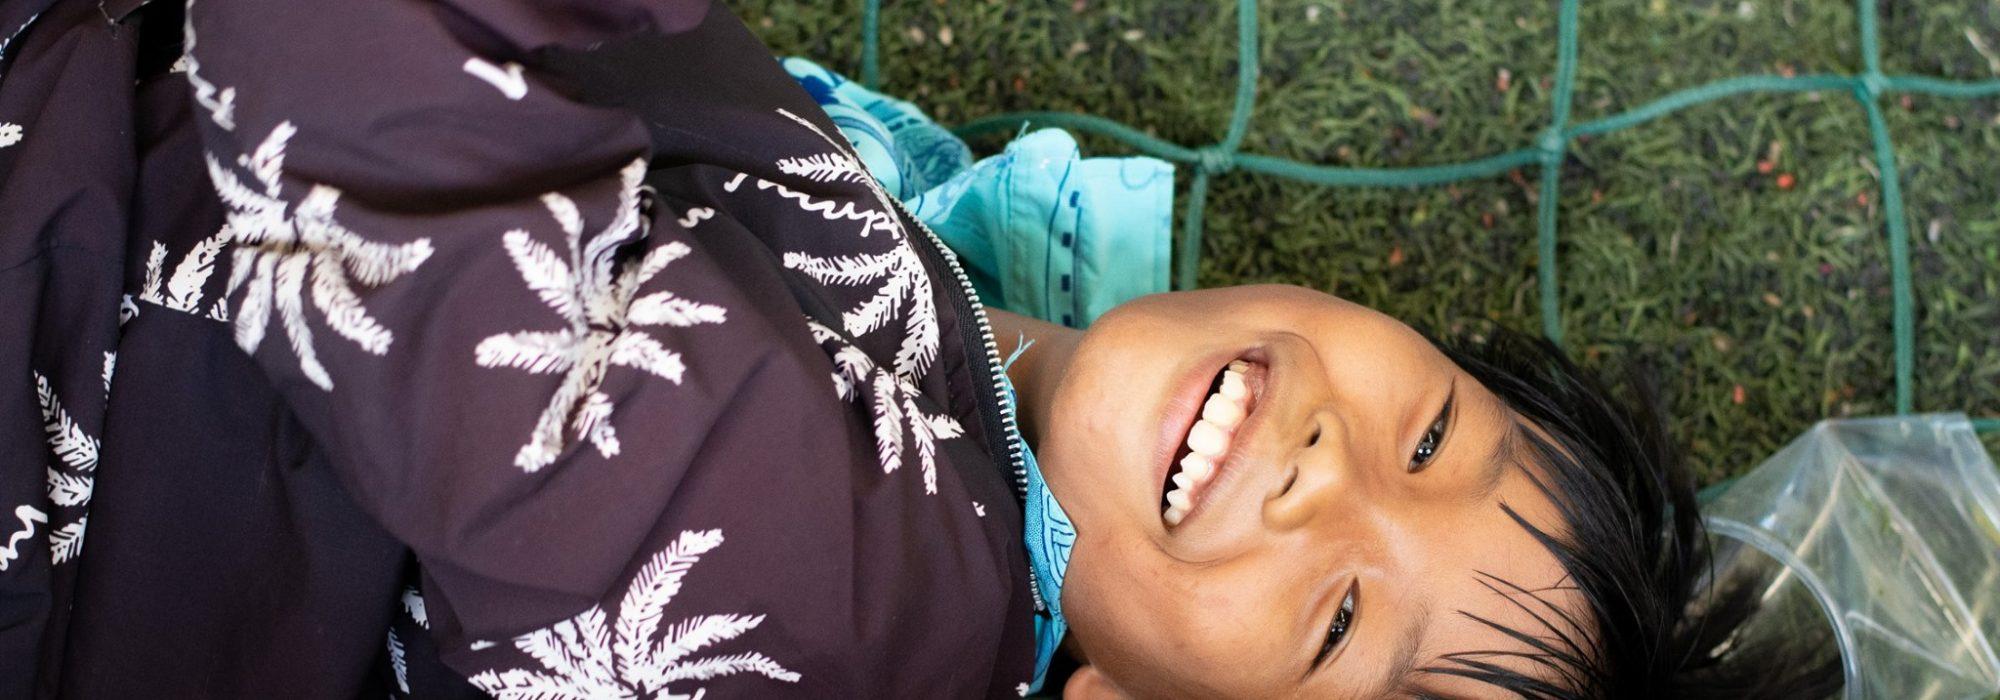 Enfants d'Asie - Cambodge